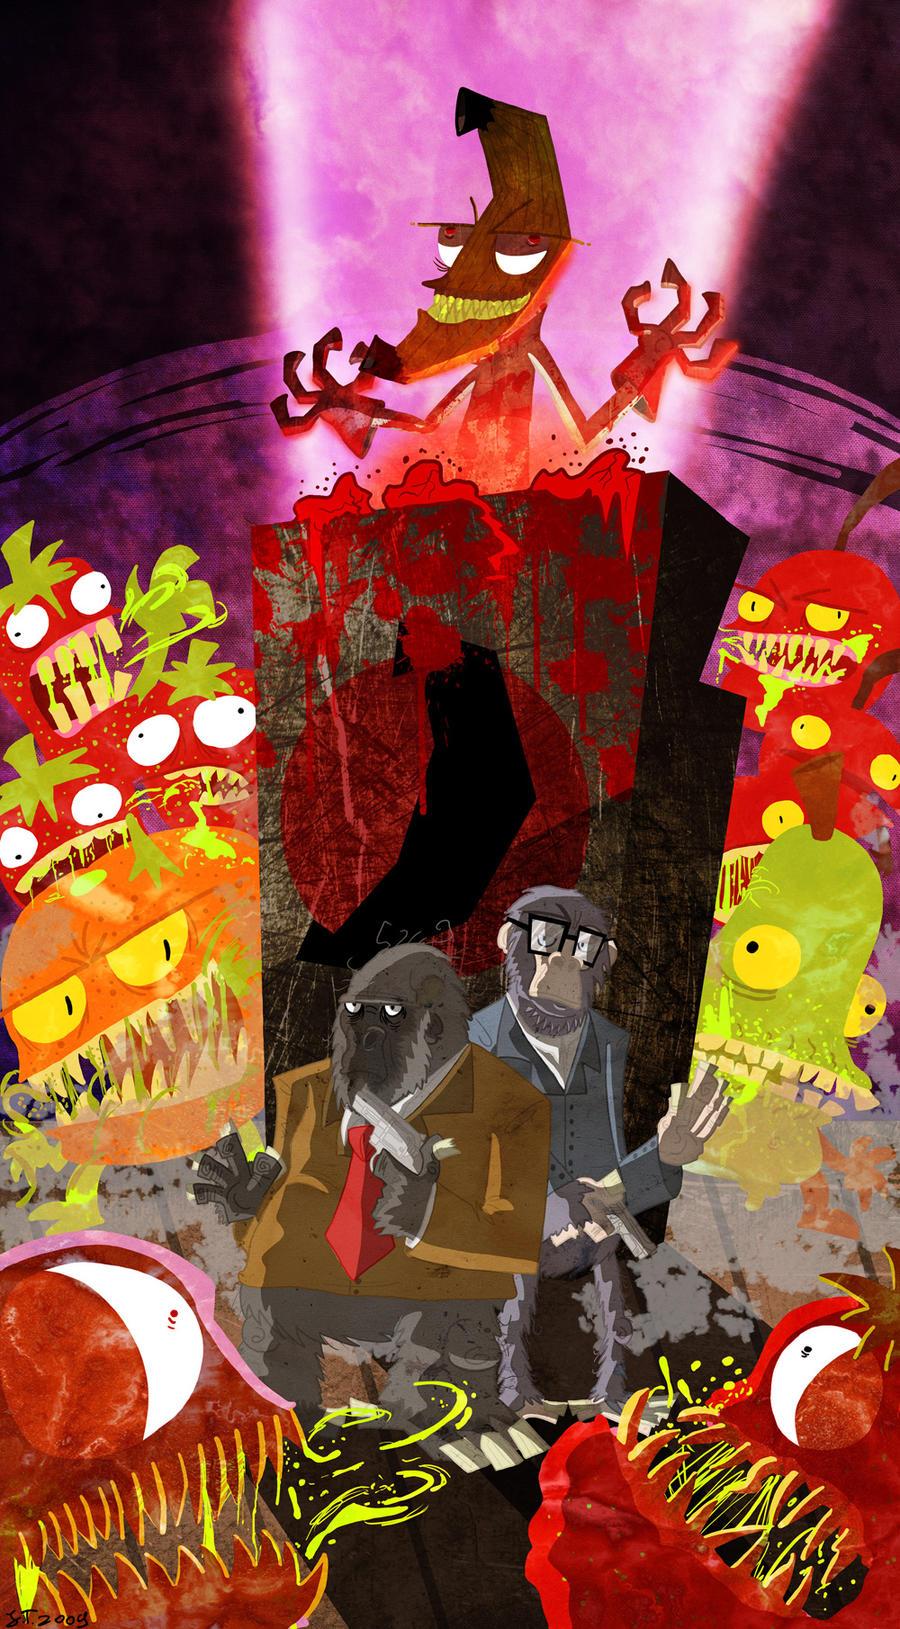 Ape inspectors vs Dr. Banana by DoctorJT